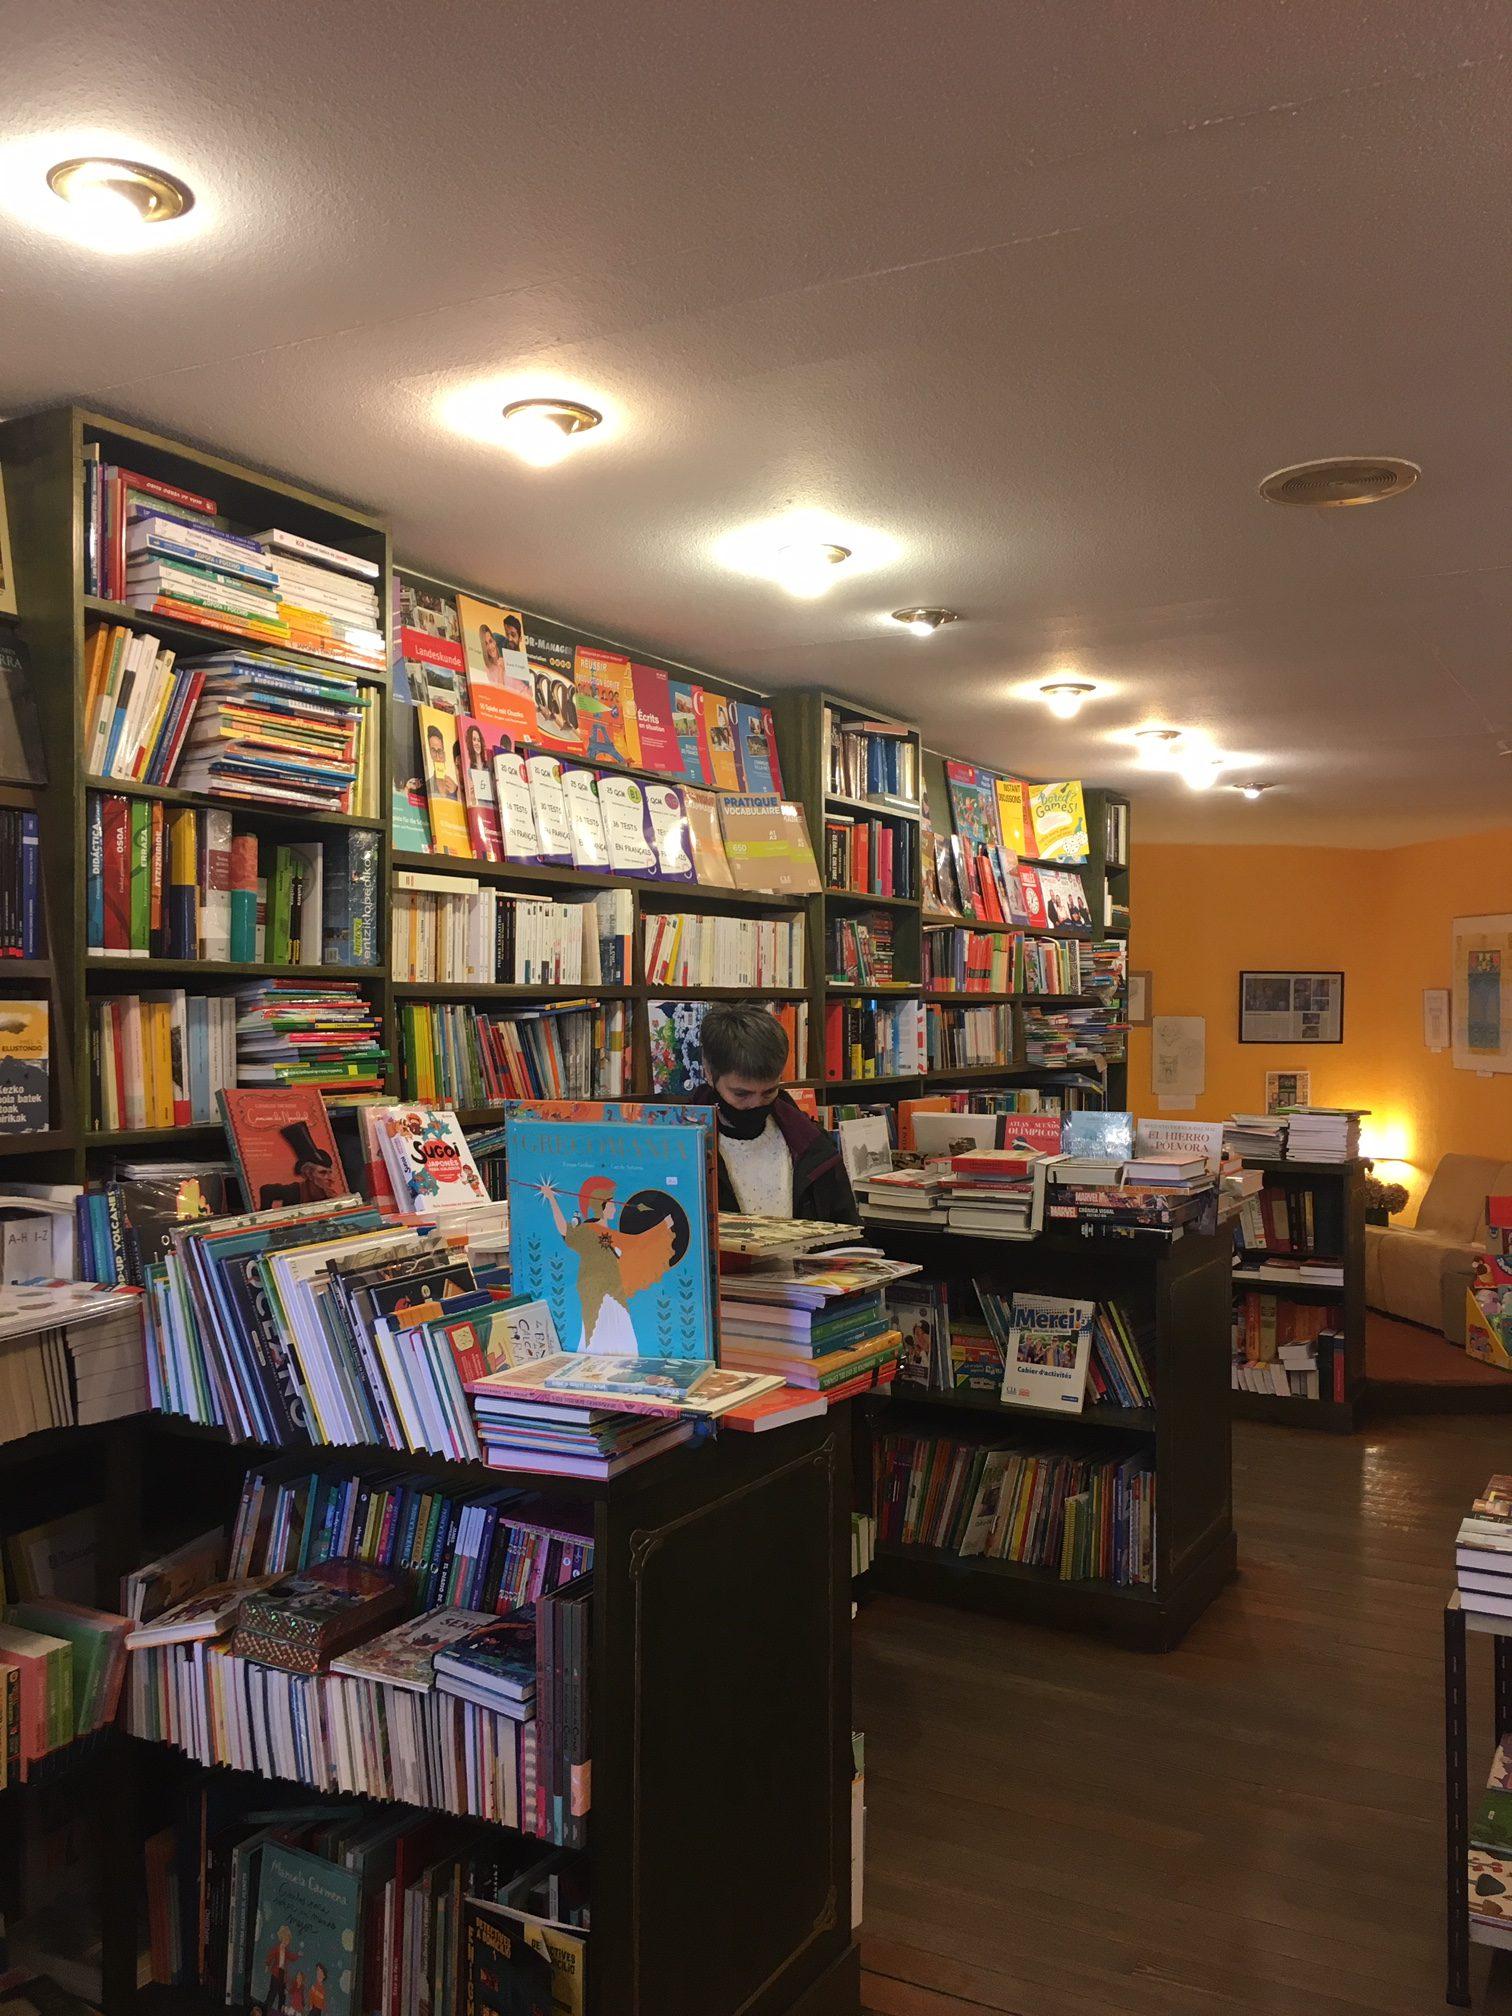 Donosti bookstore in San Sebastian